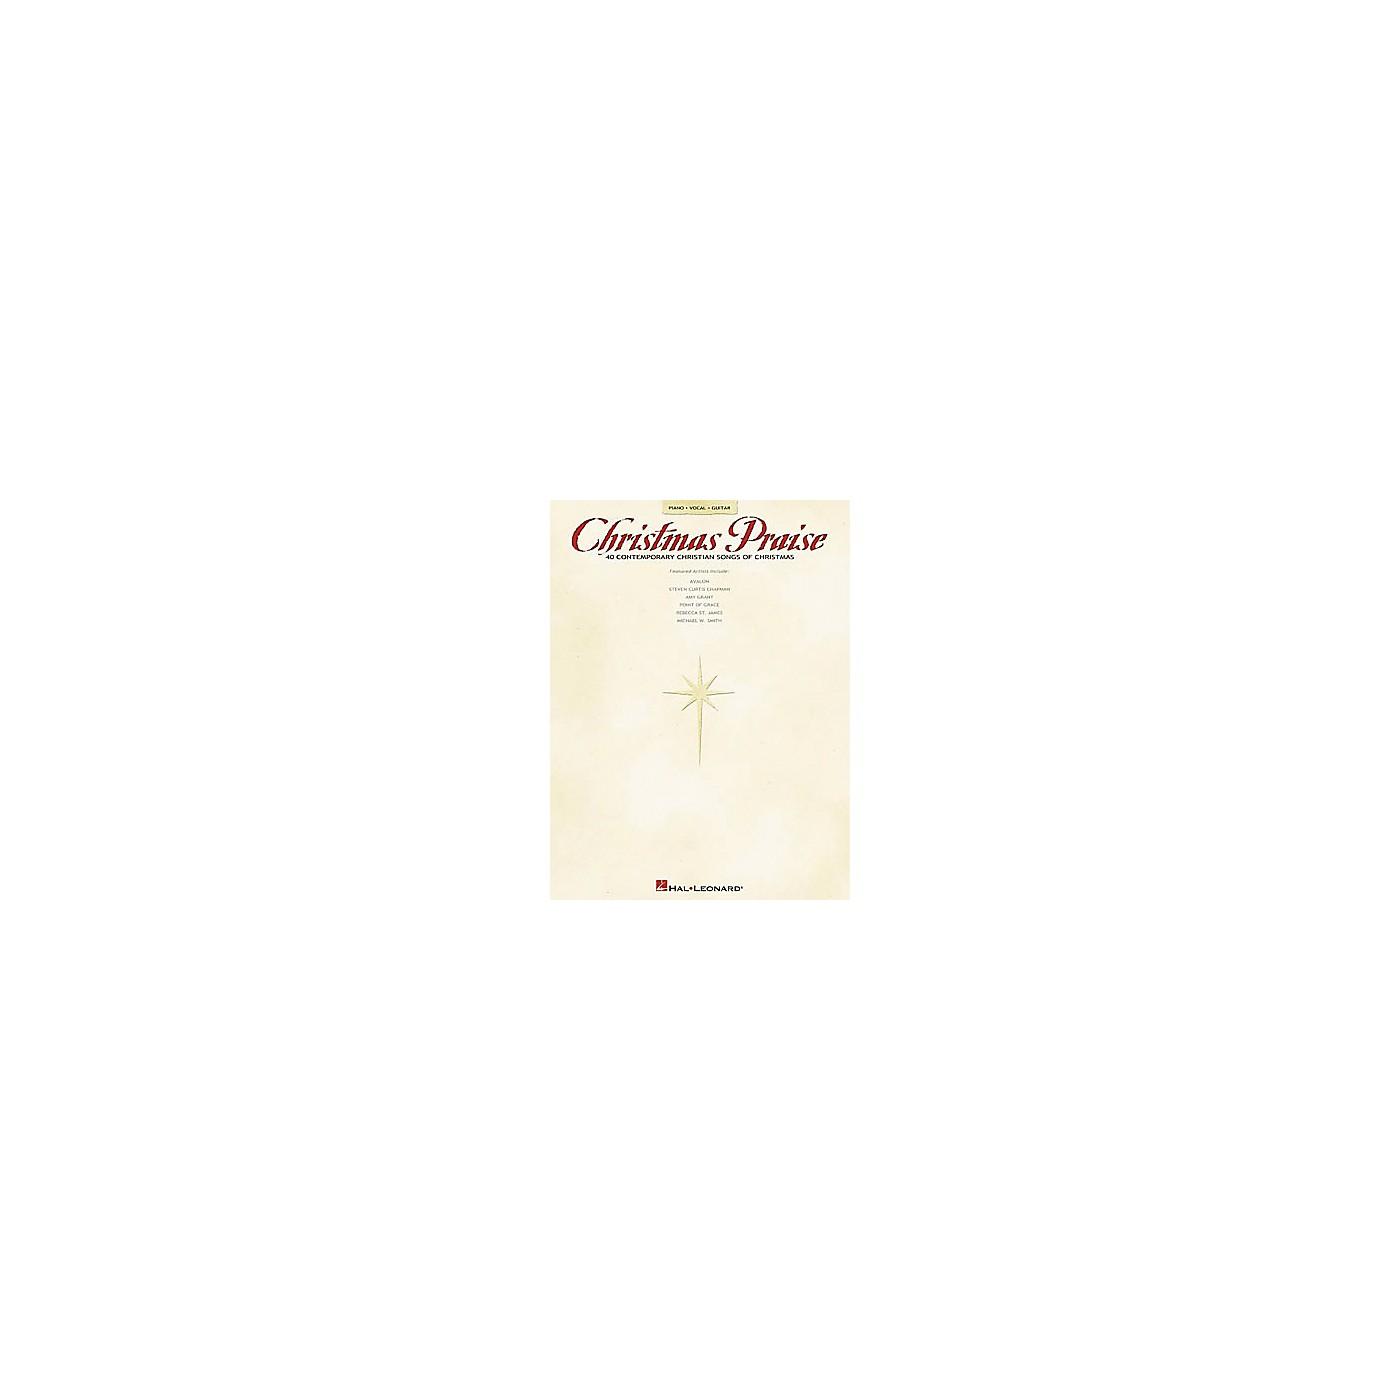 Hal Leonard Christmas Praise Piano, Vocal, Guitar Songbook thumbnail